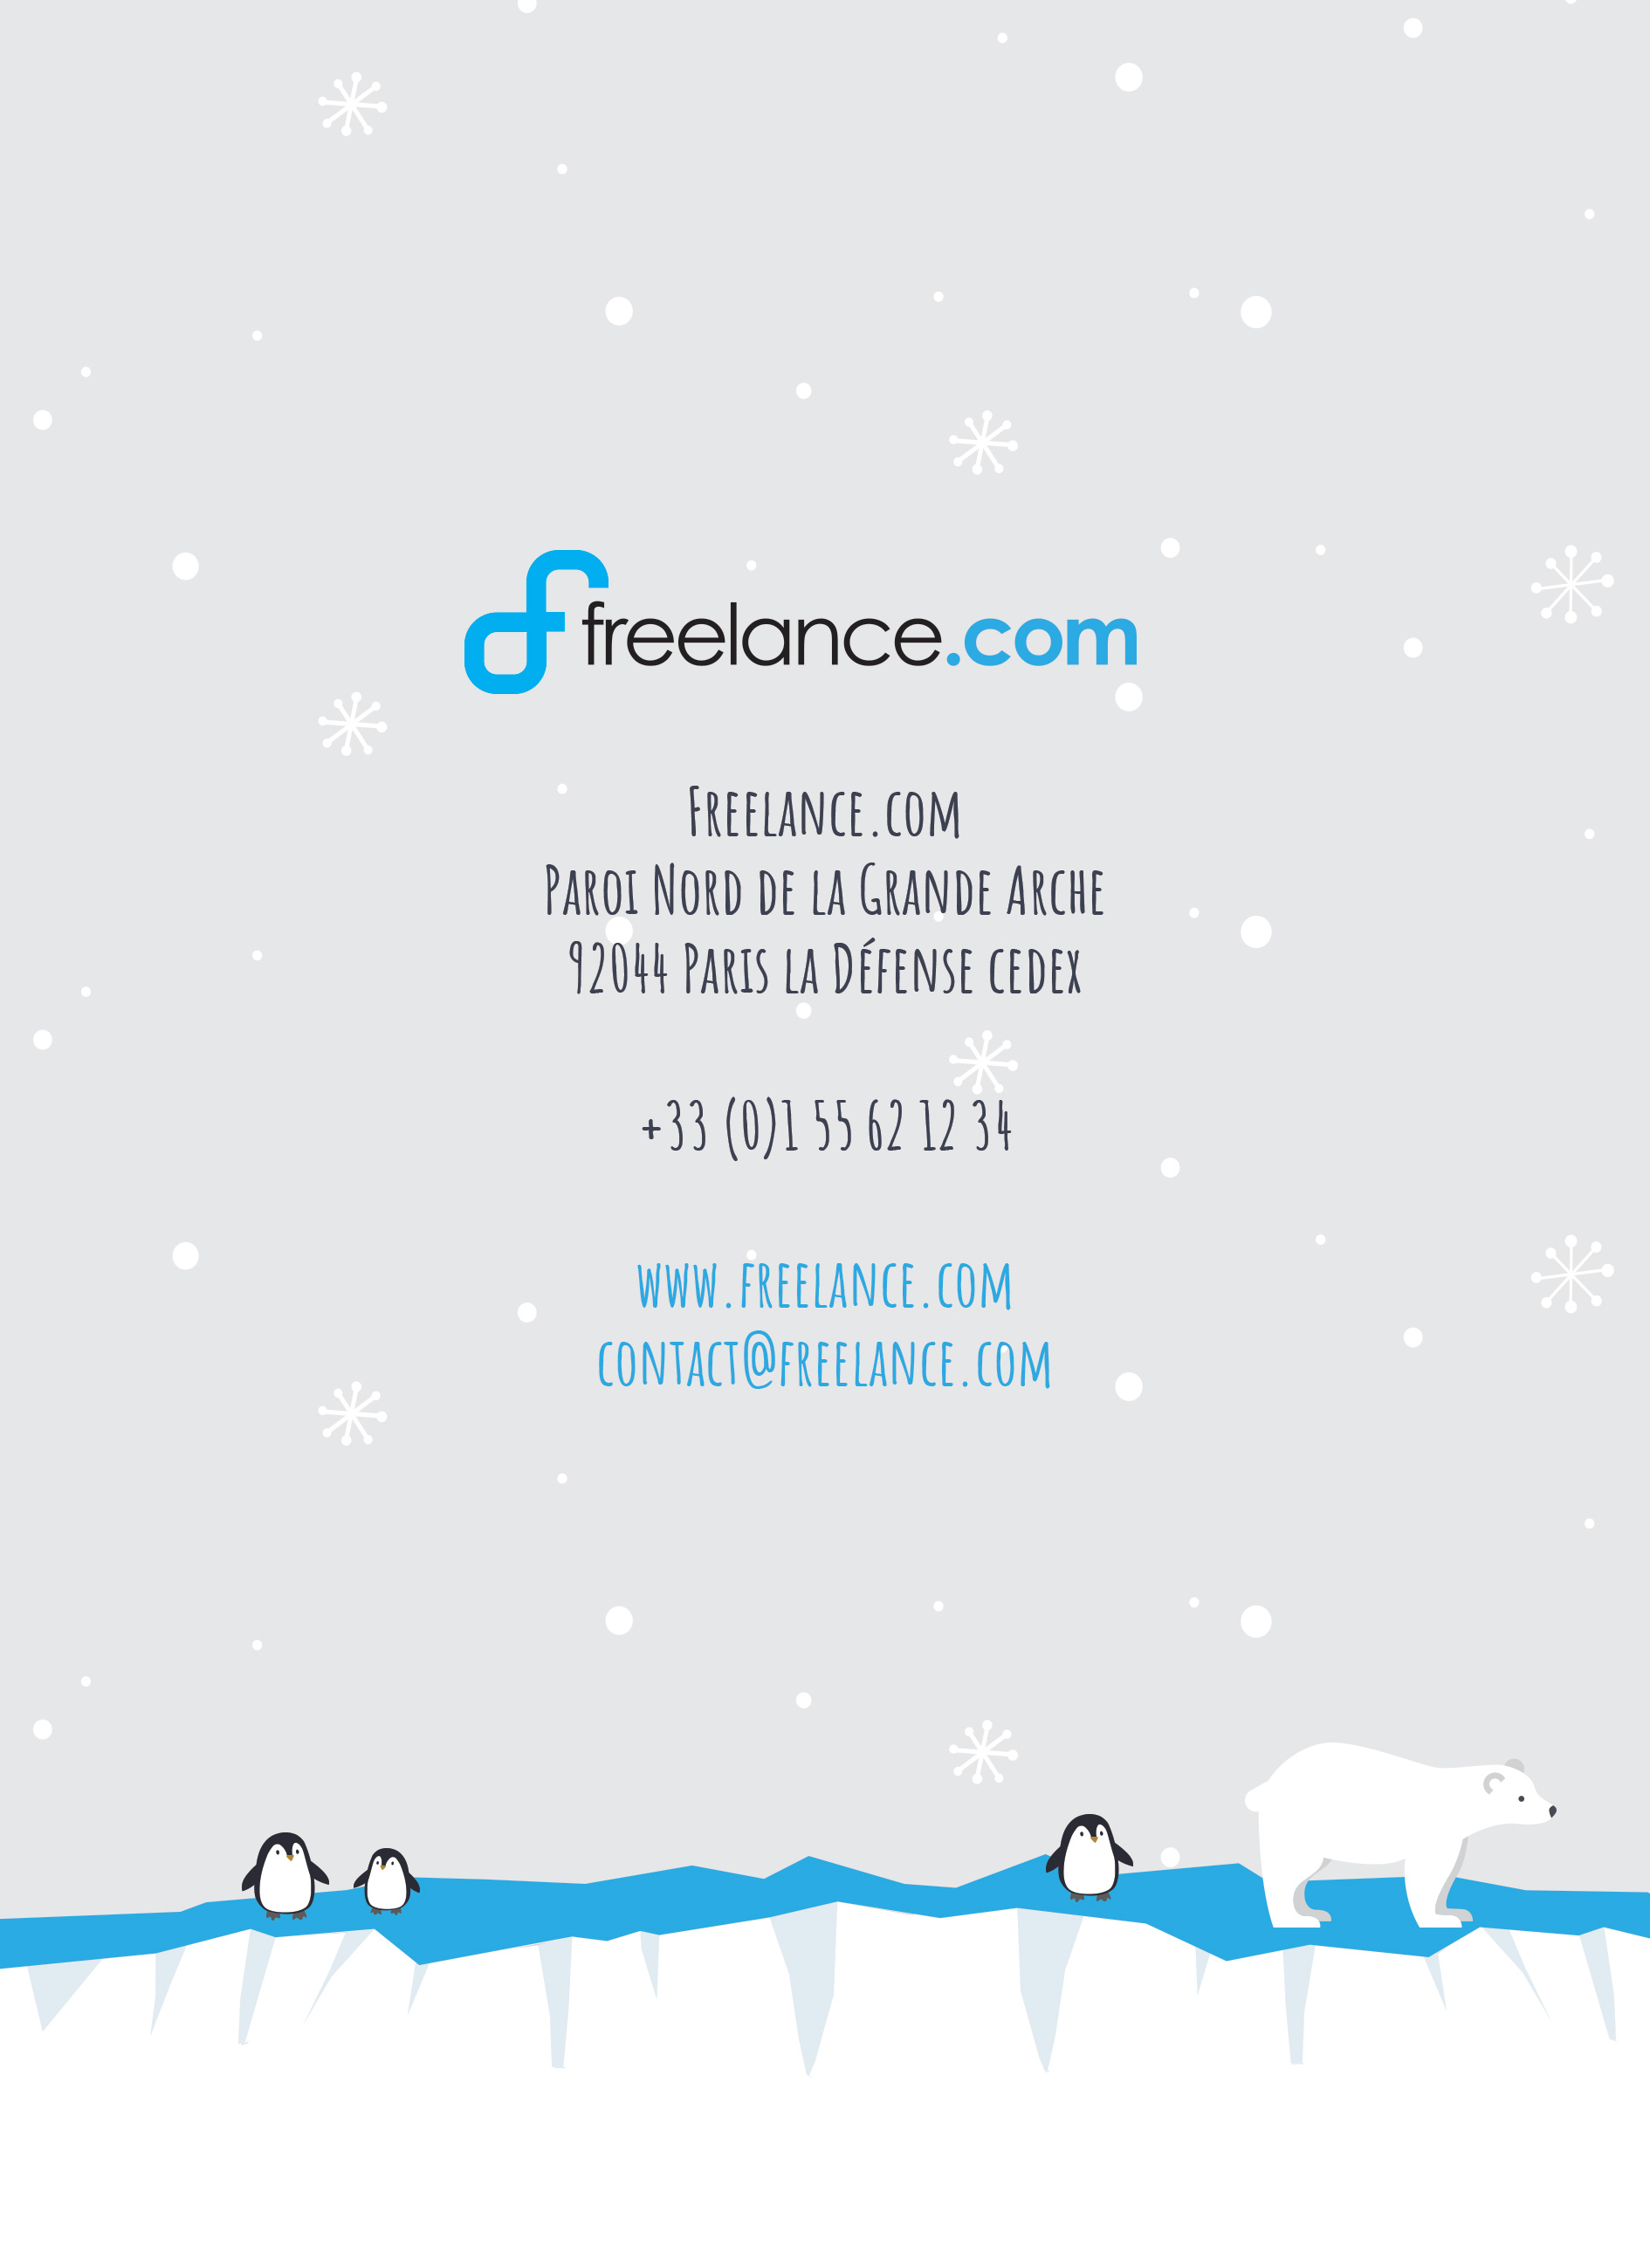 freelance-voeux-3